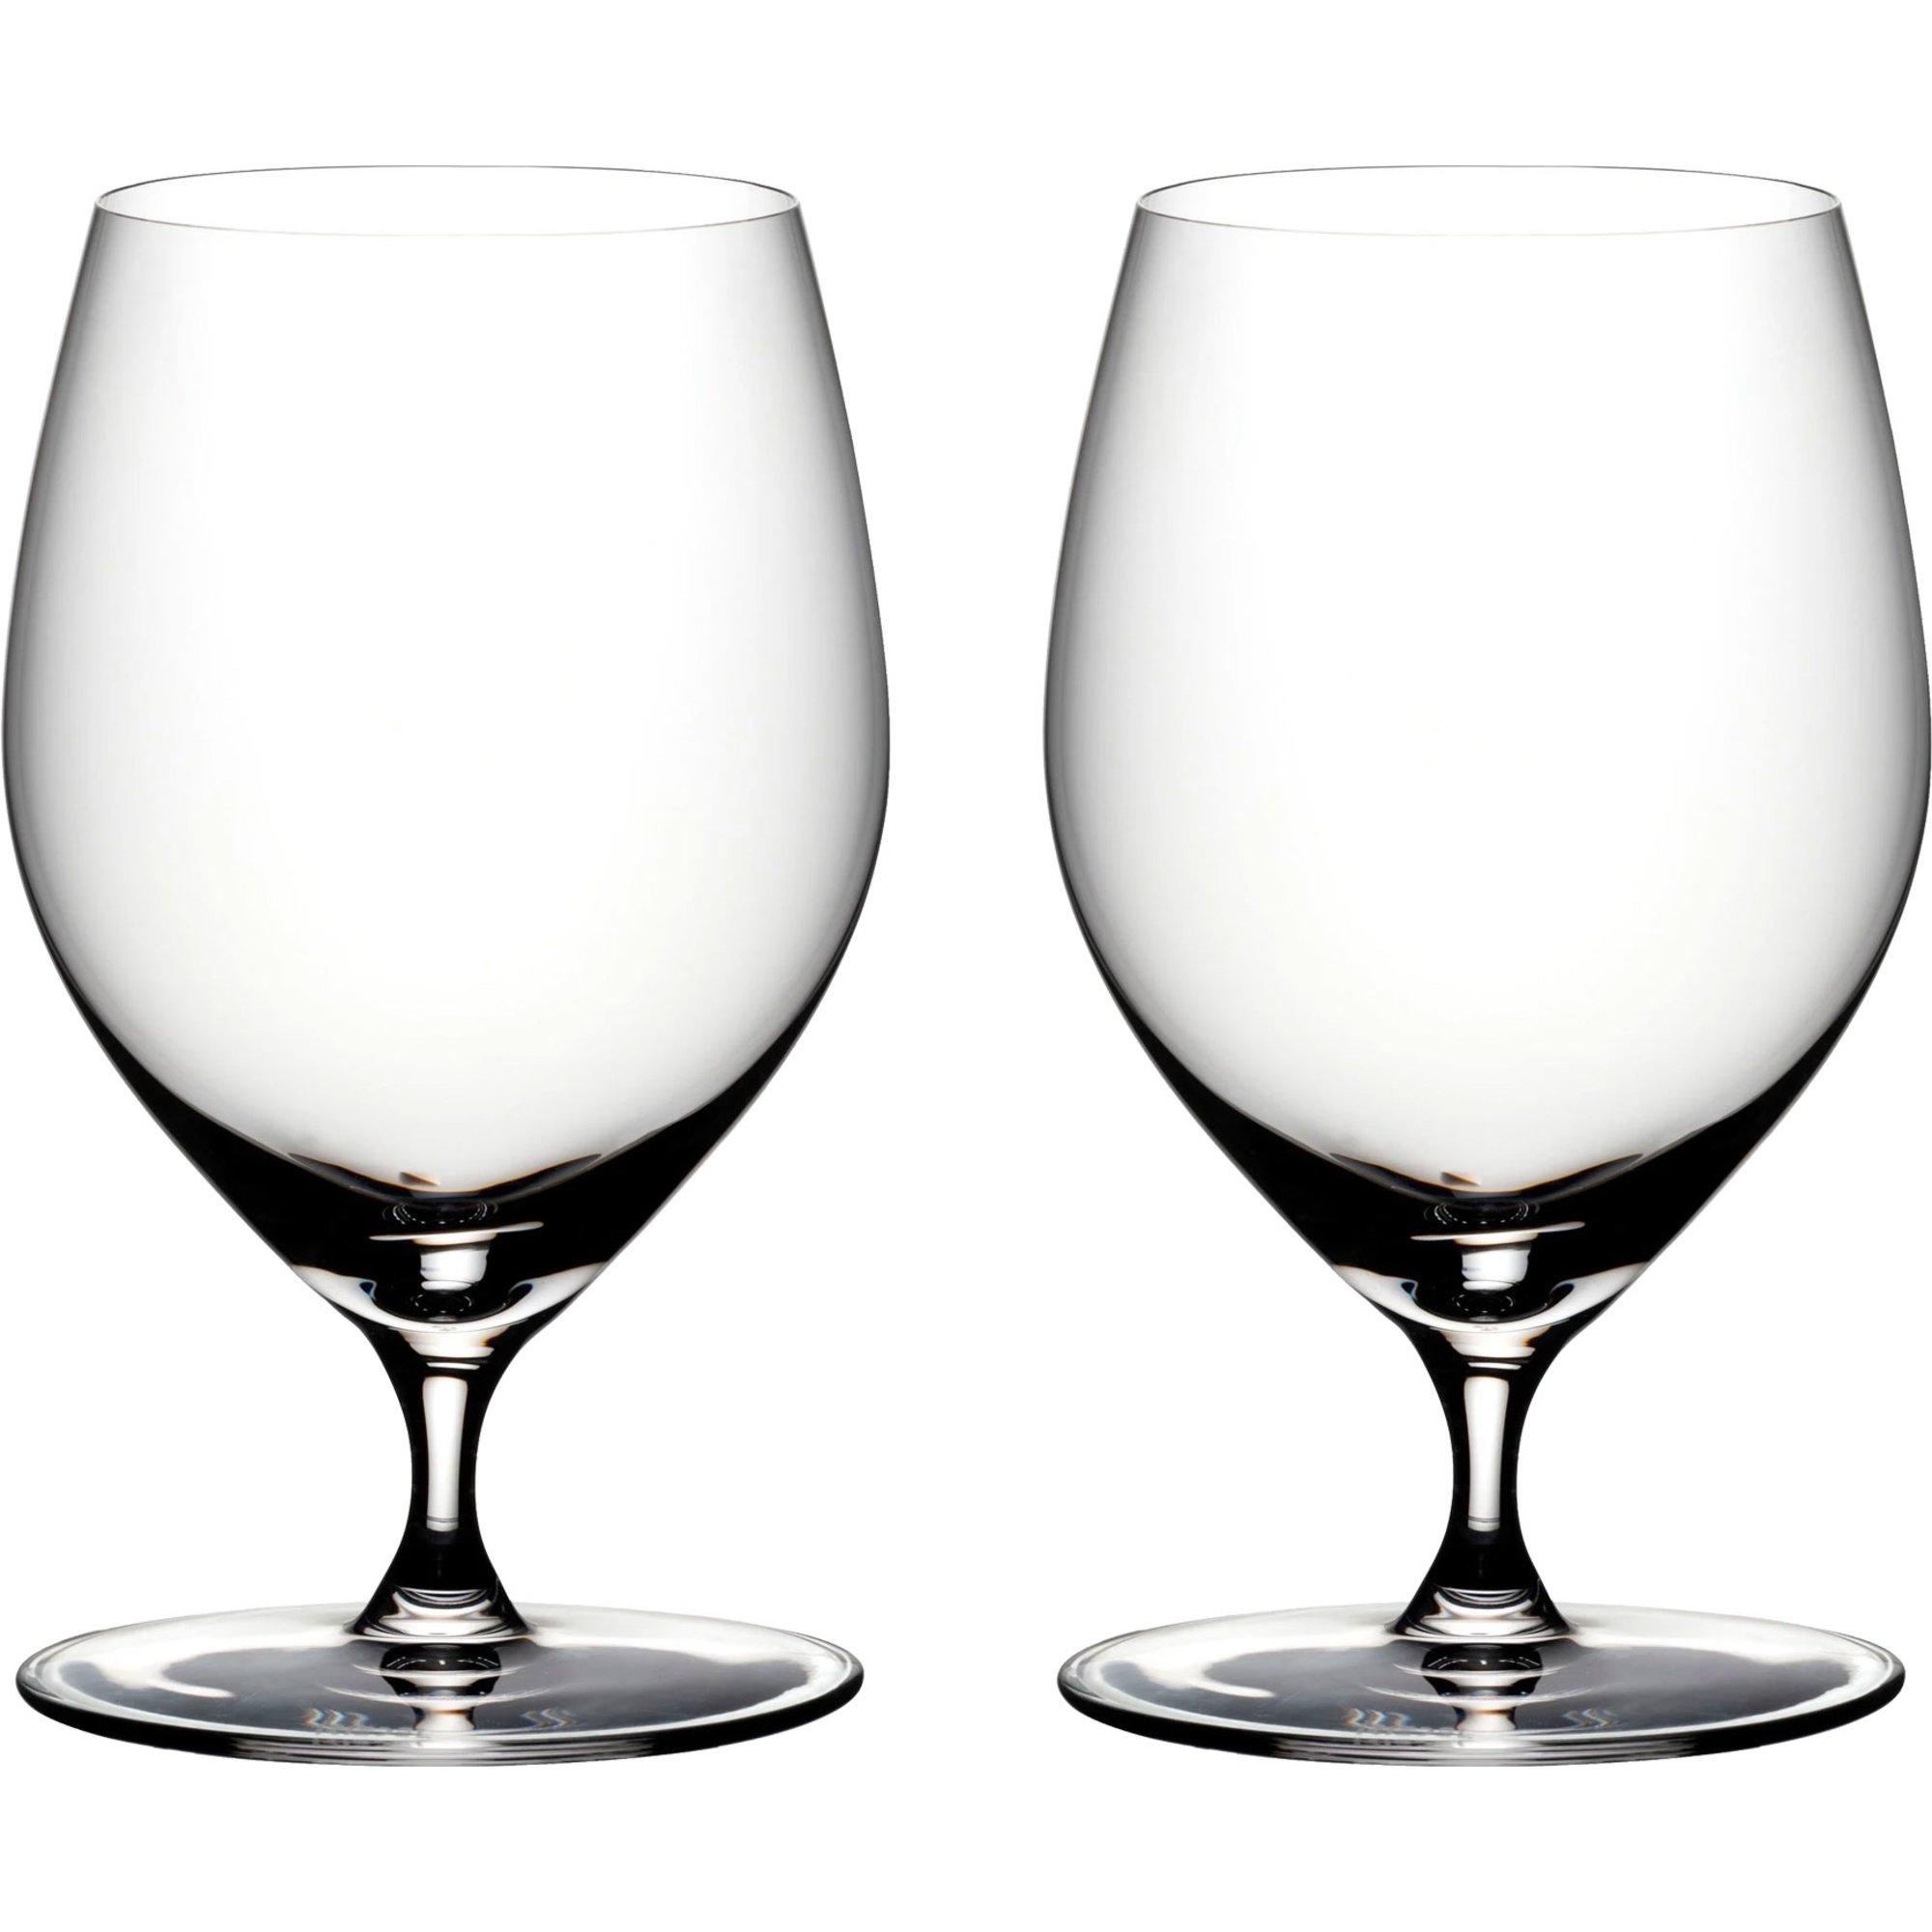 Riedel Veritas vattenglas 2 st.